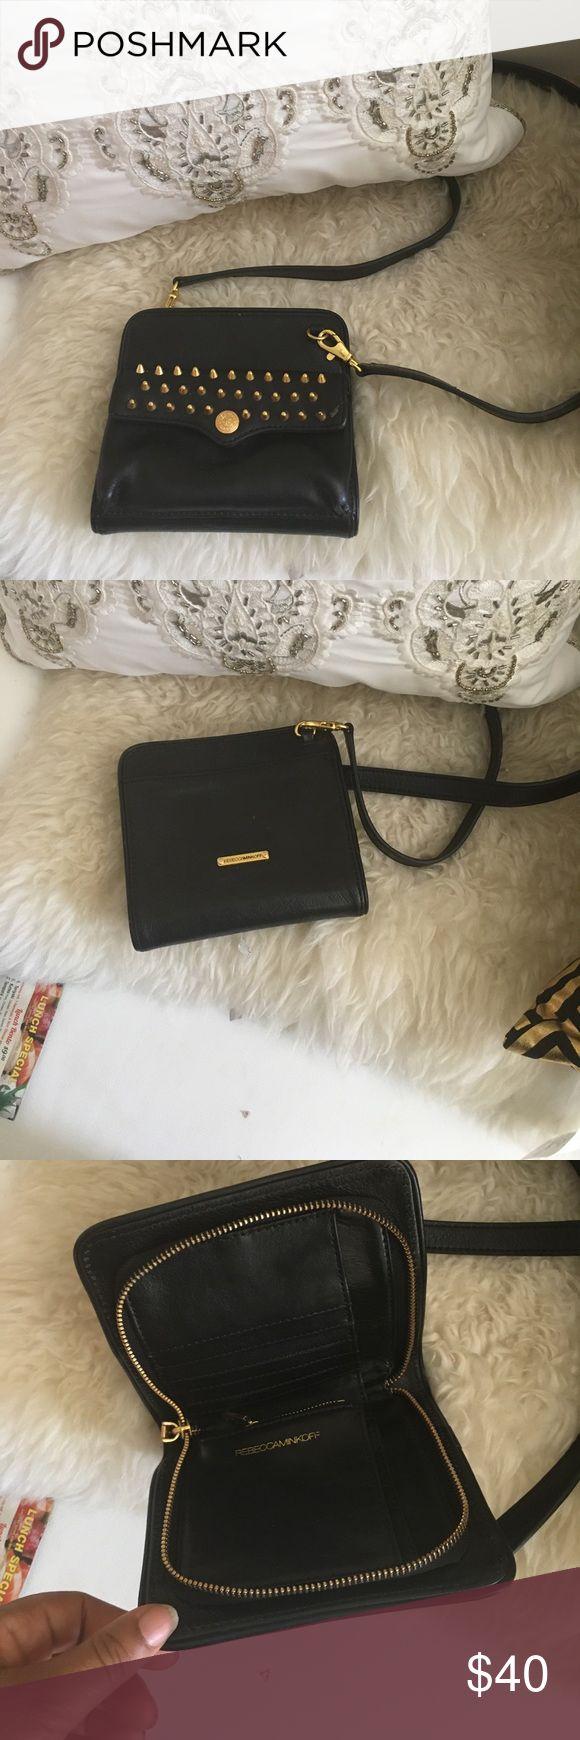 Rebecca Minkoff purse Rebecca Minkoff black leather purse bag Bags Mini Bags